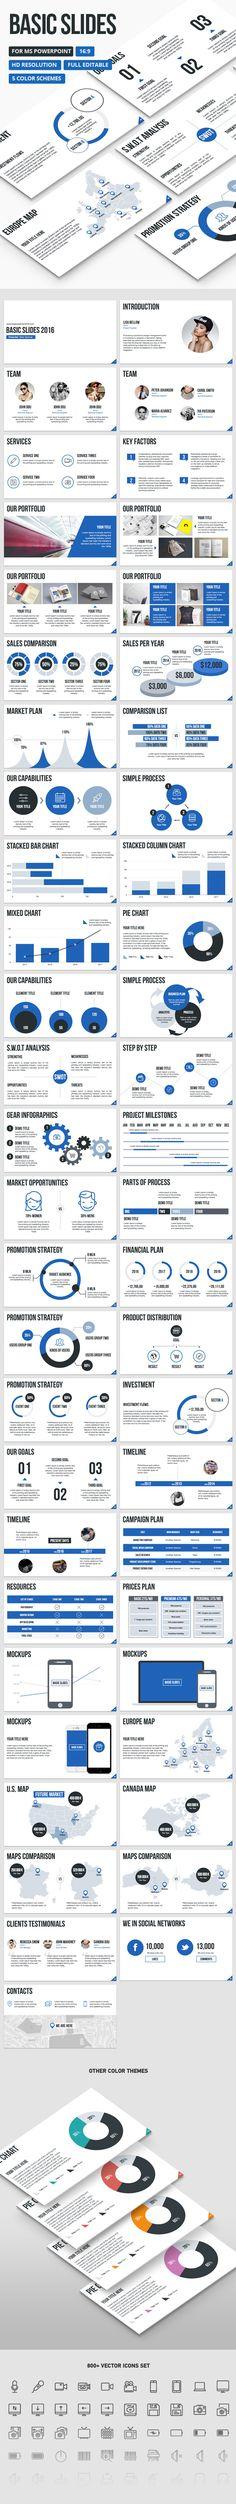 Basic Slides - PowerPoint Presentation Template. Download here: https://graphicriver.net/item/basic-slides-powerpoint-presentation-template/17034425?ref=ksioks